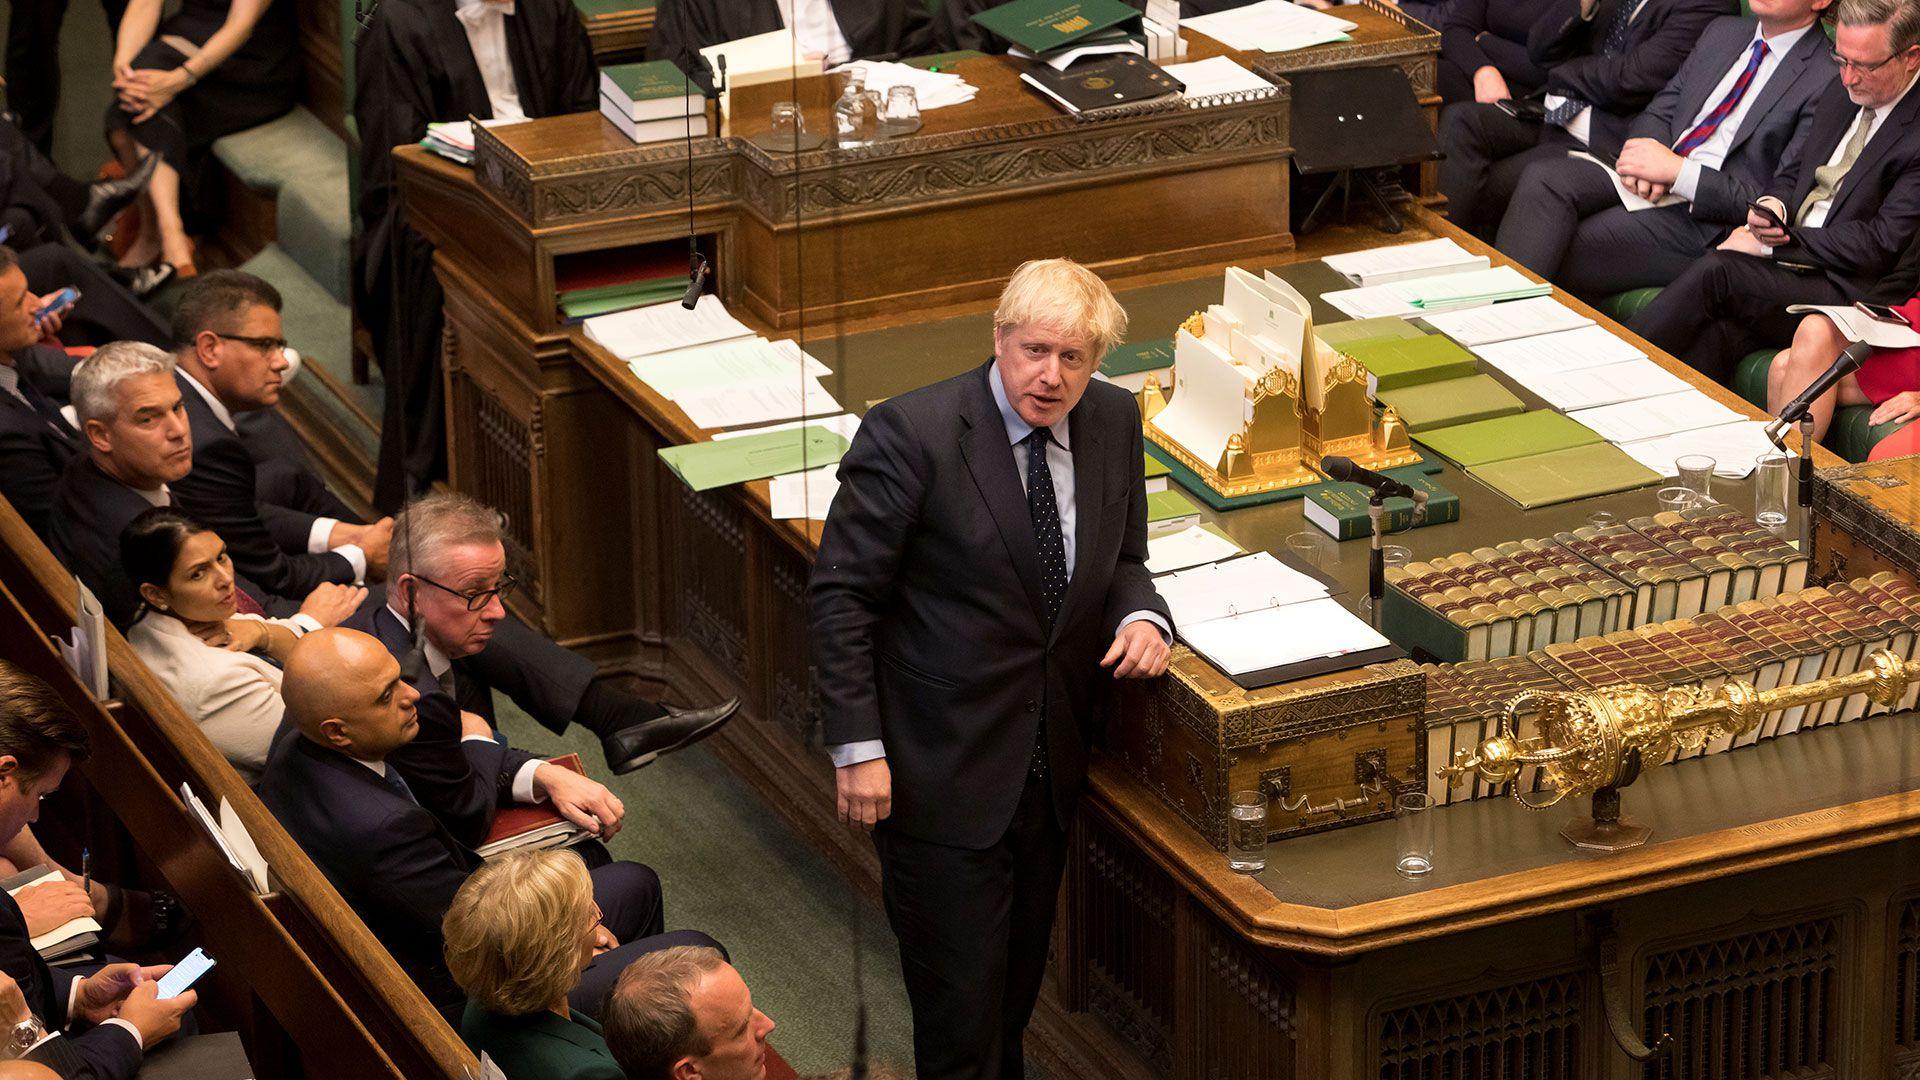 Boris Johnsonen el Parlamento Británico (©UK Parliament/Roger Harris/Handout via REUTERS)